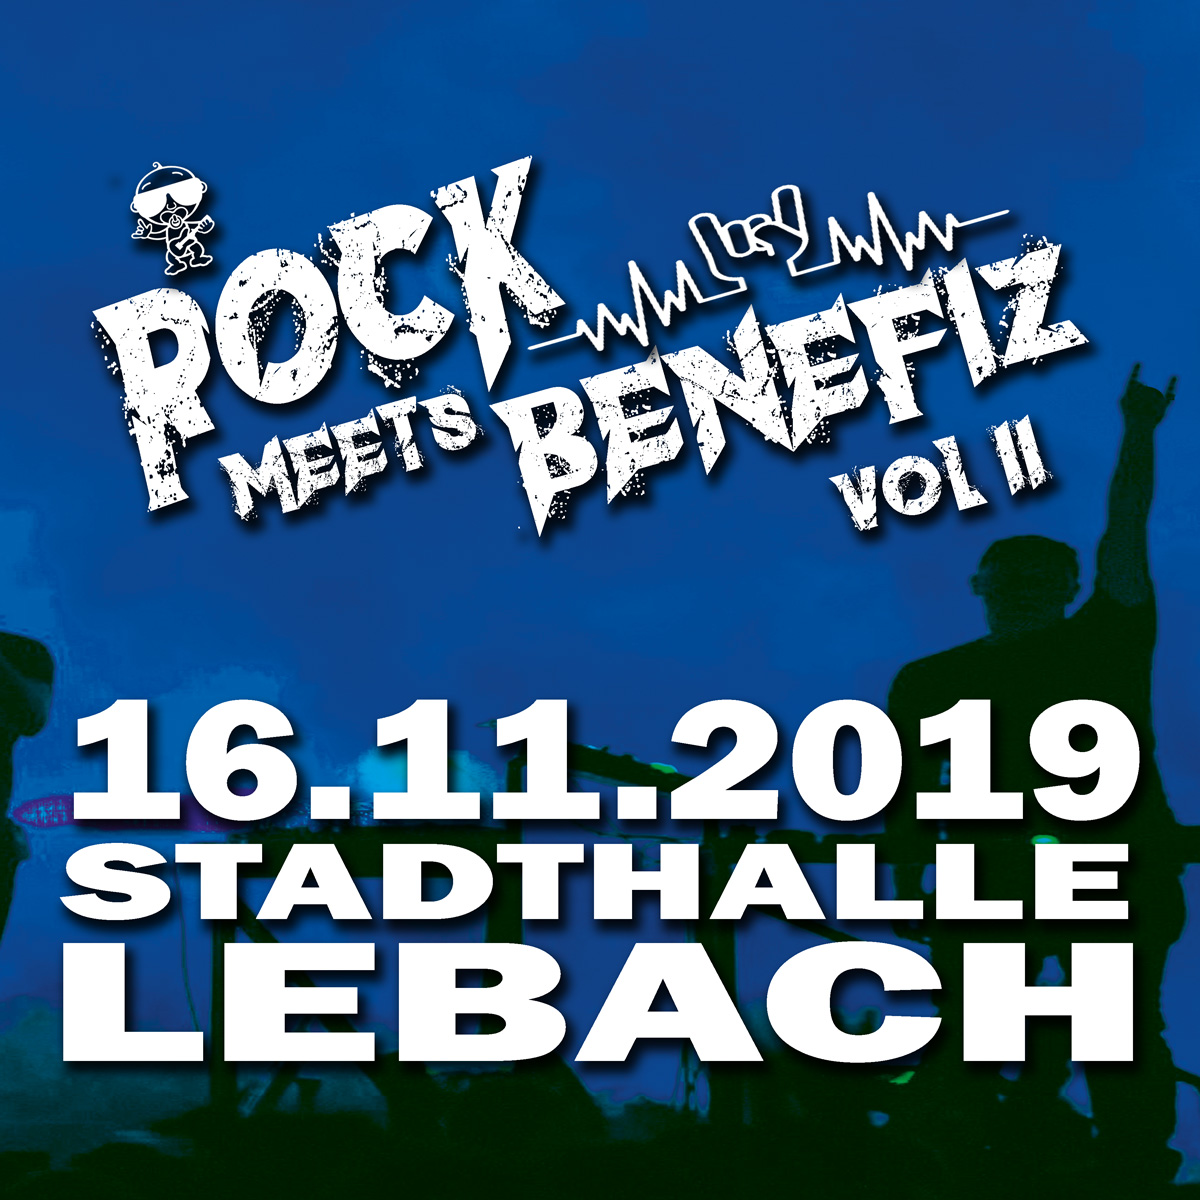 Rock meets Benefiz 2019 16.11.2019 Stadhalle Lebach